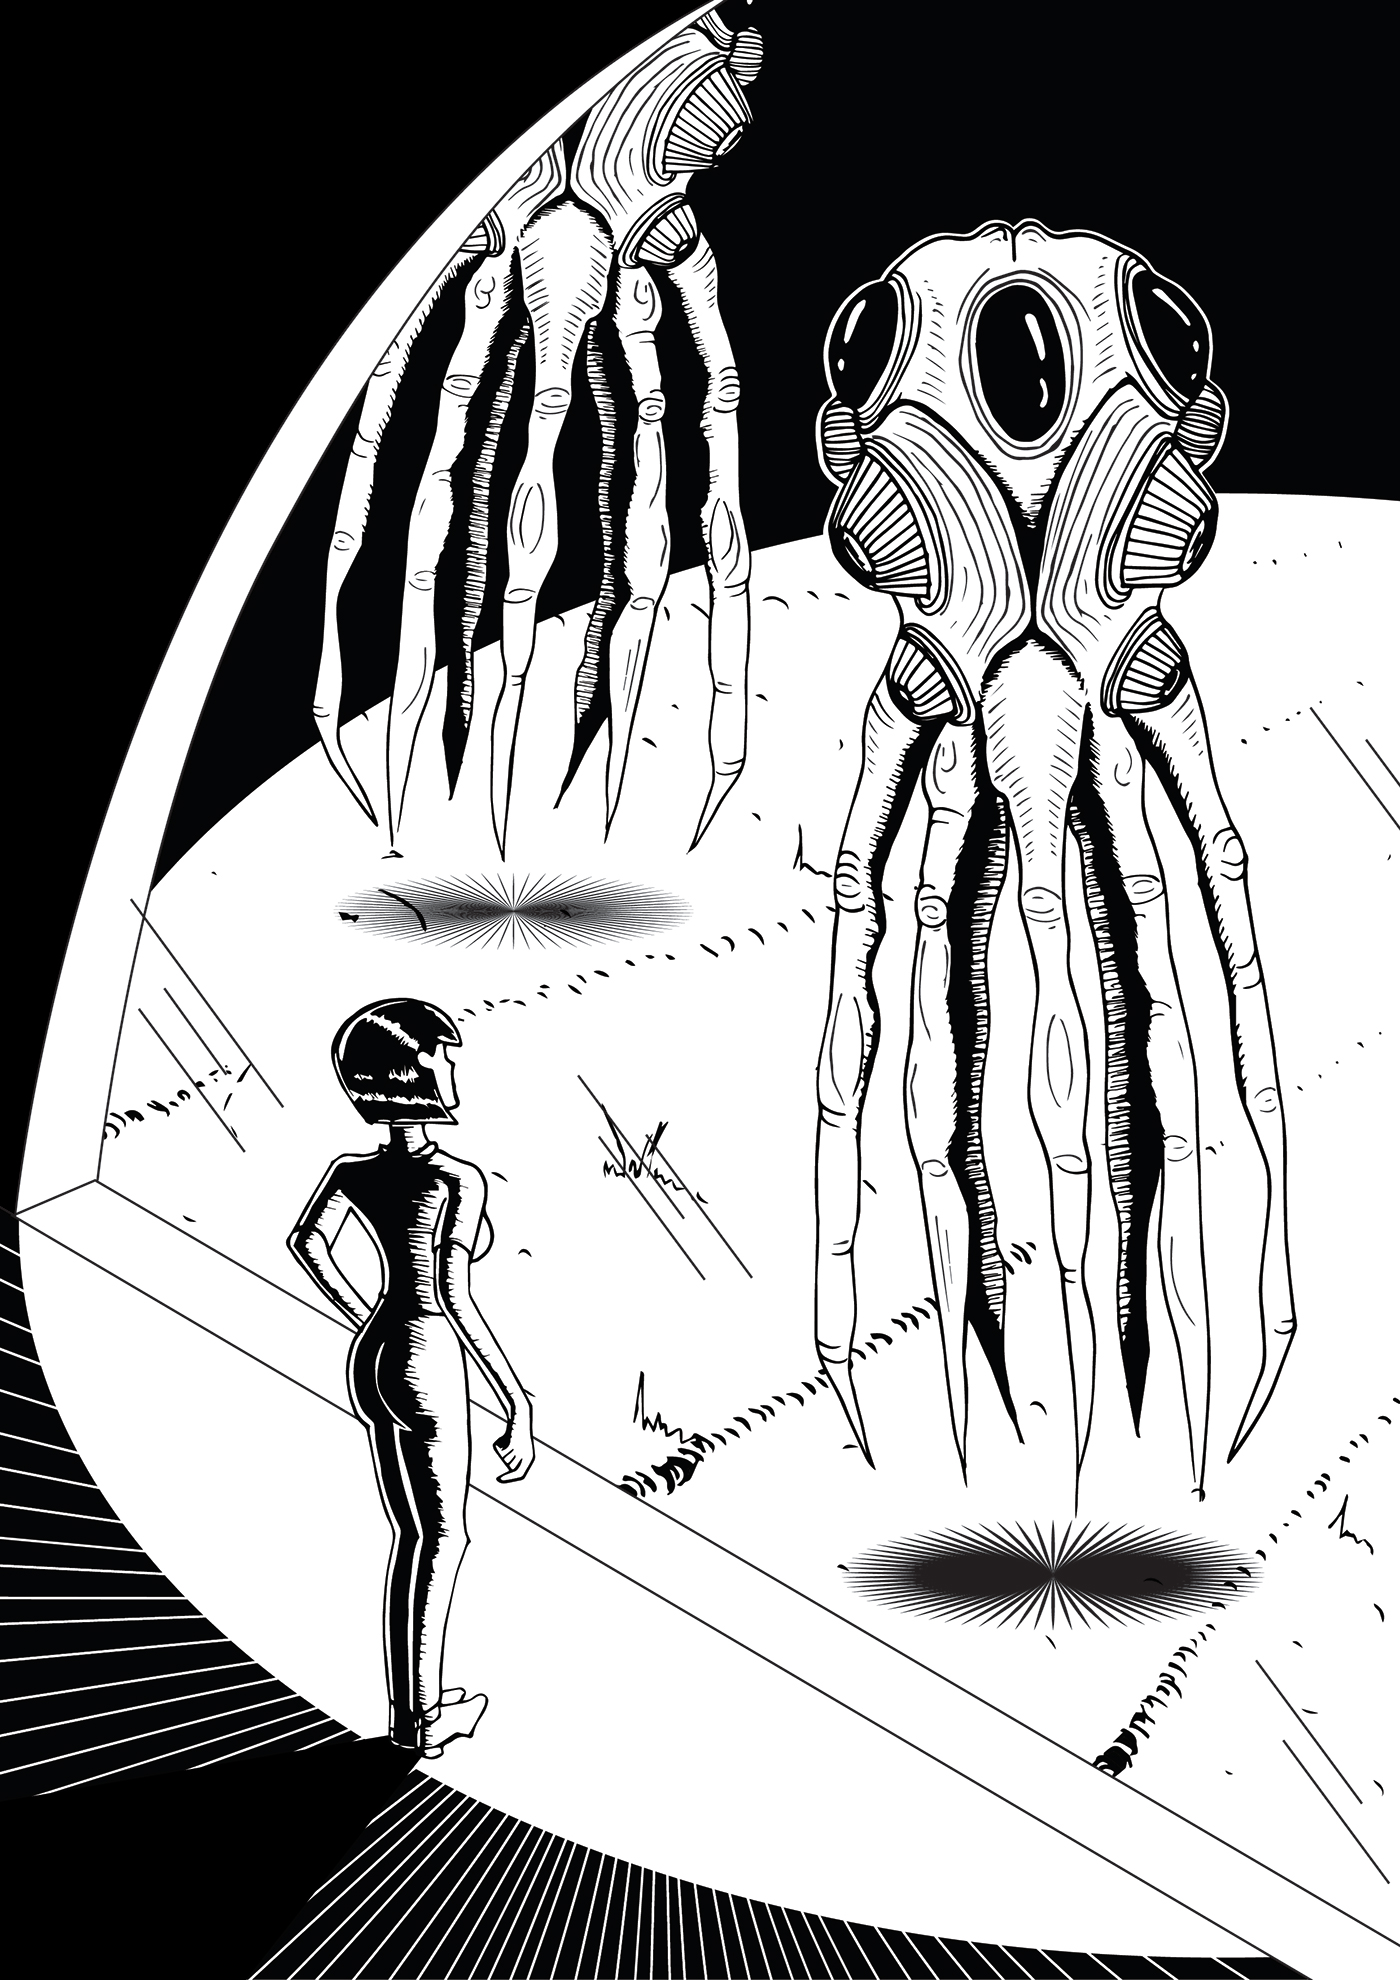 Illustrator photoshop Film   alien ILLUSTRATION  black White thearrival